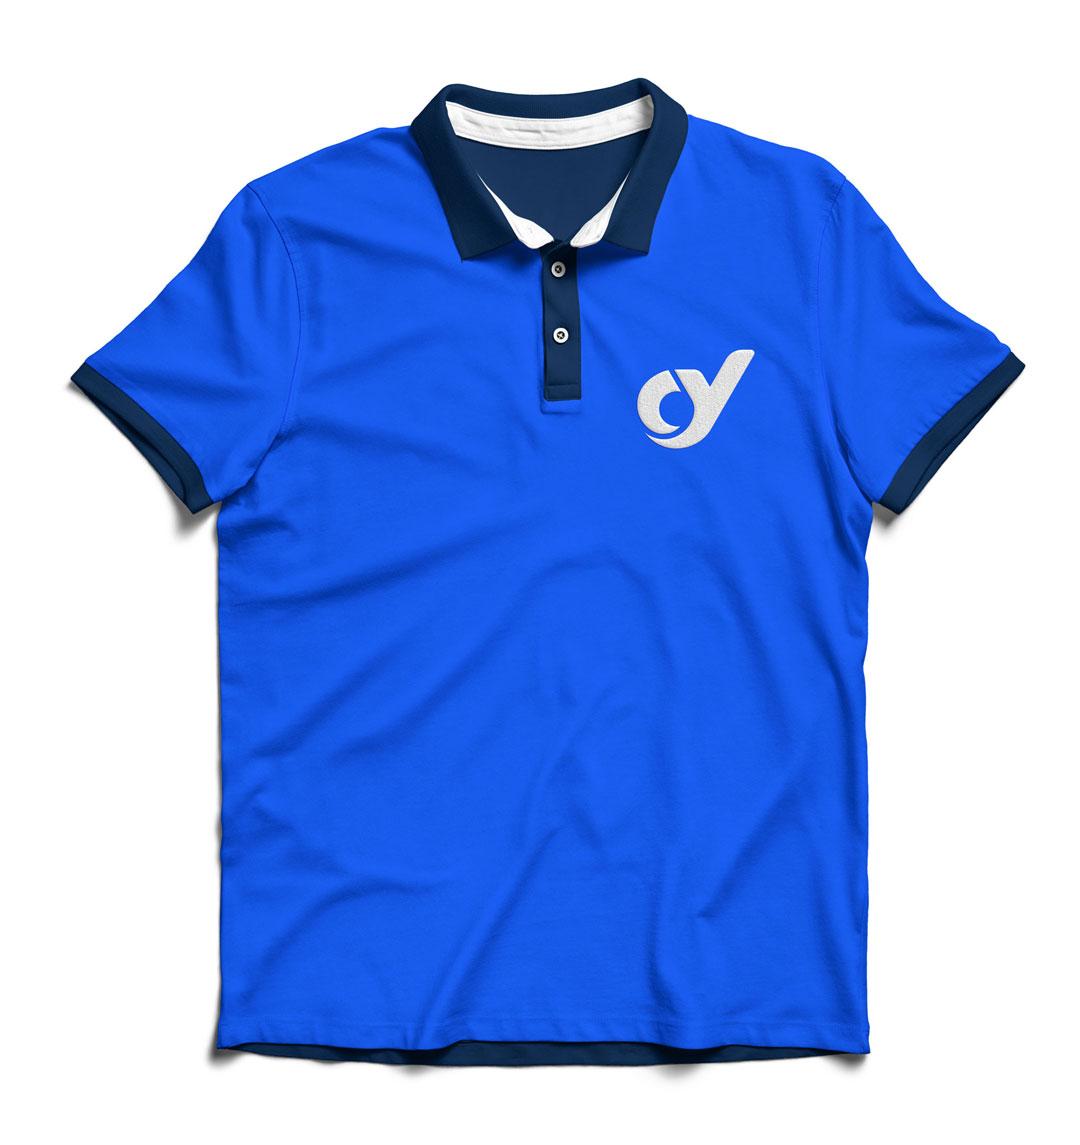 t-shirt-oy-1-01